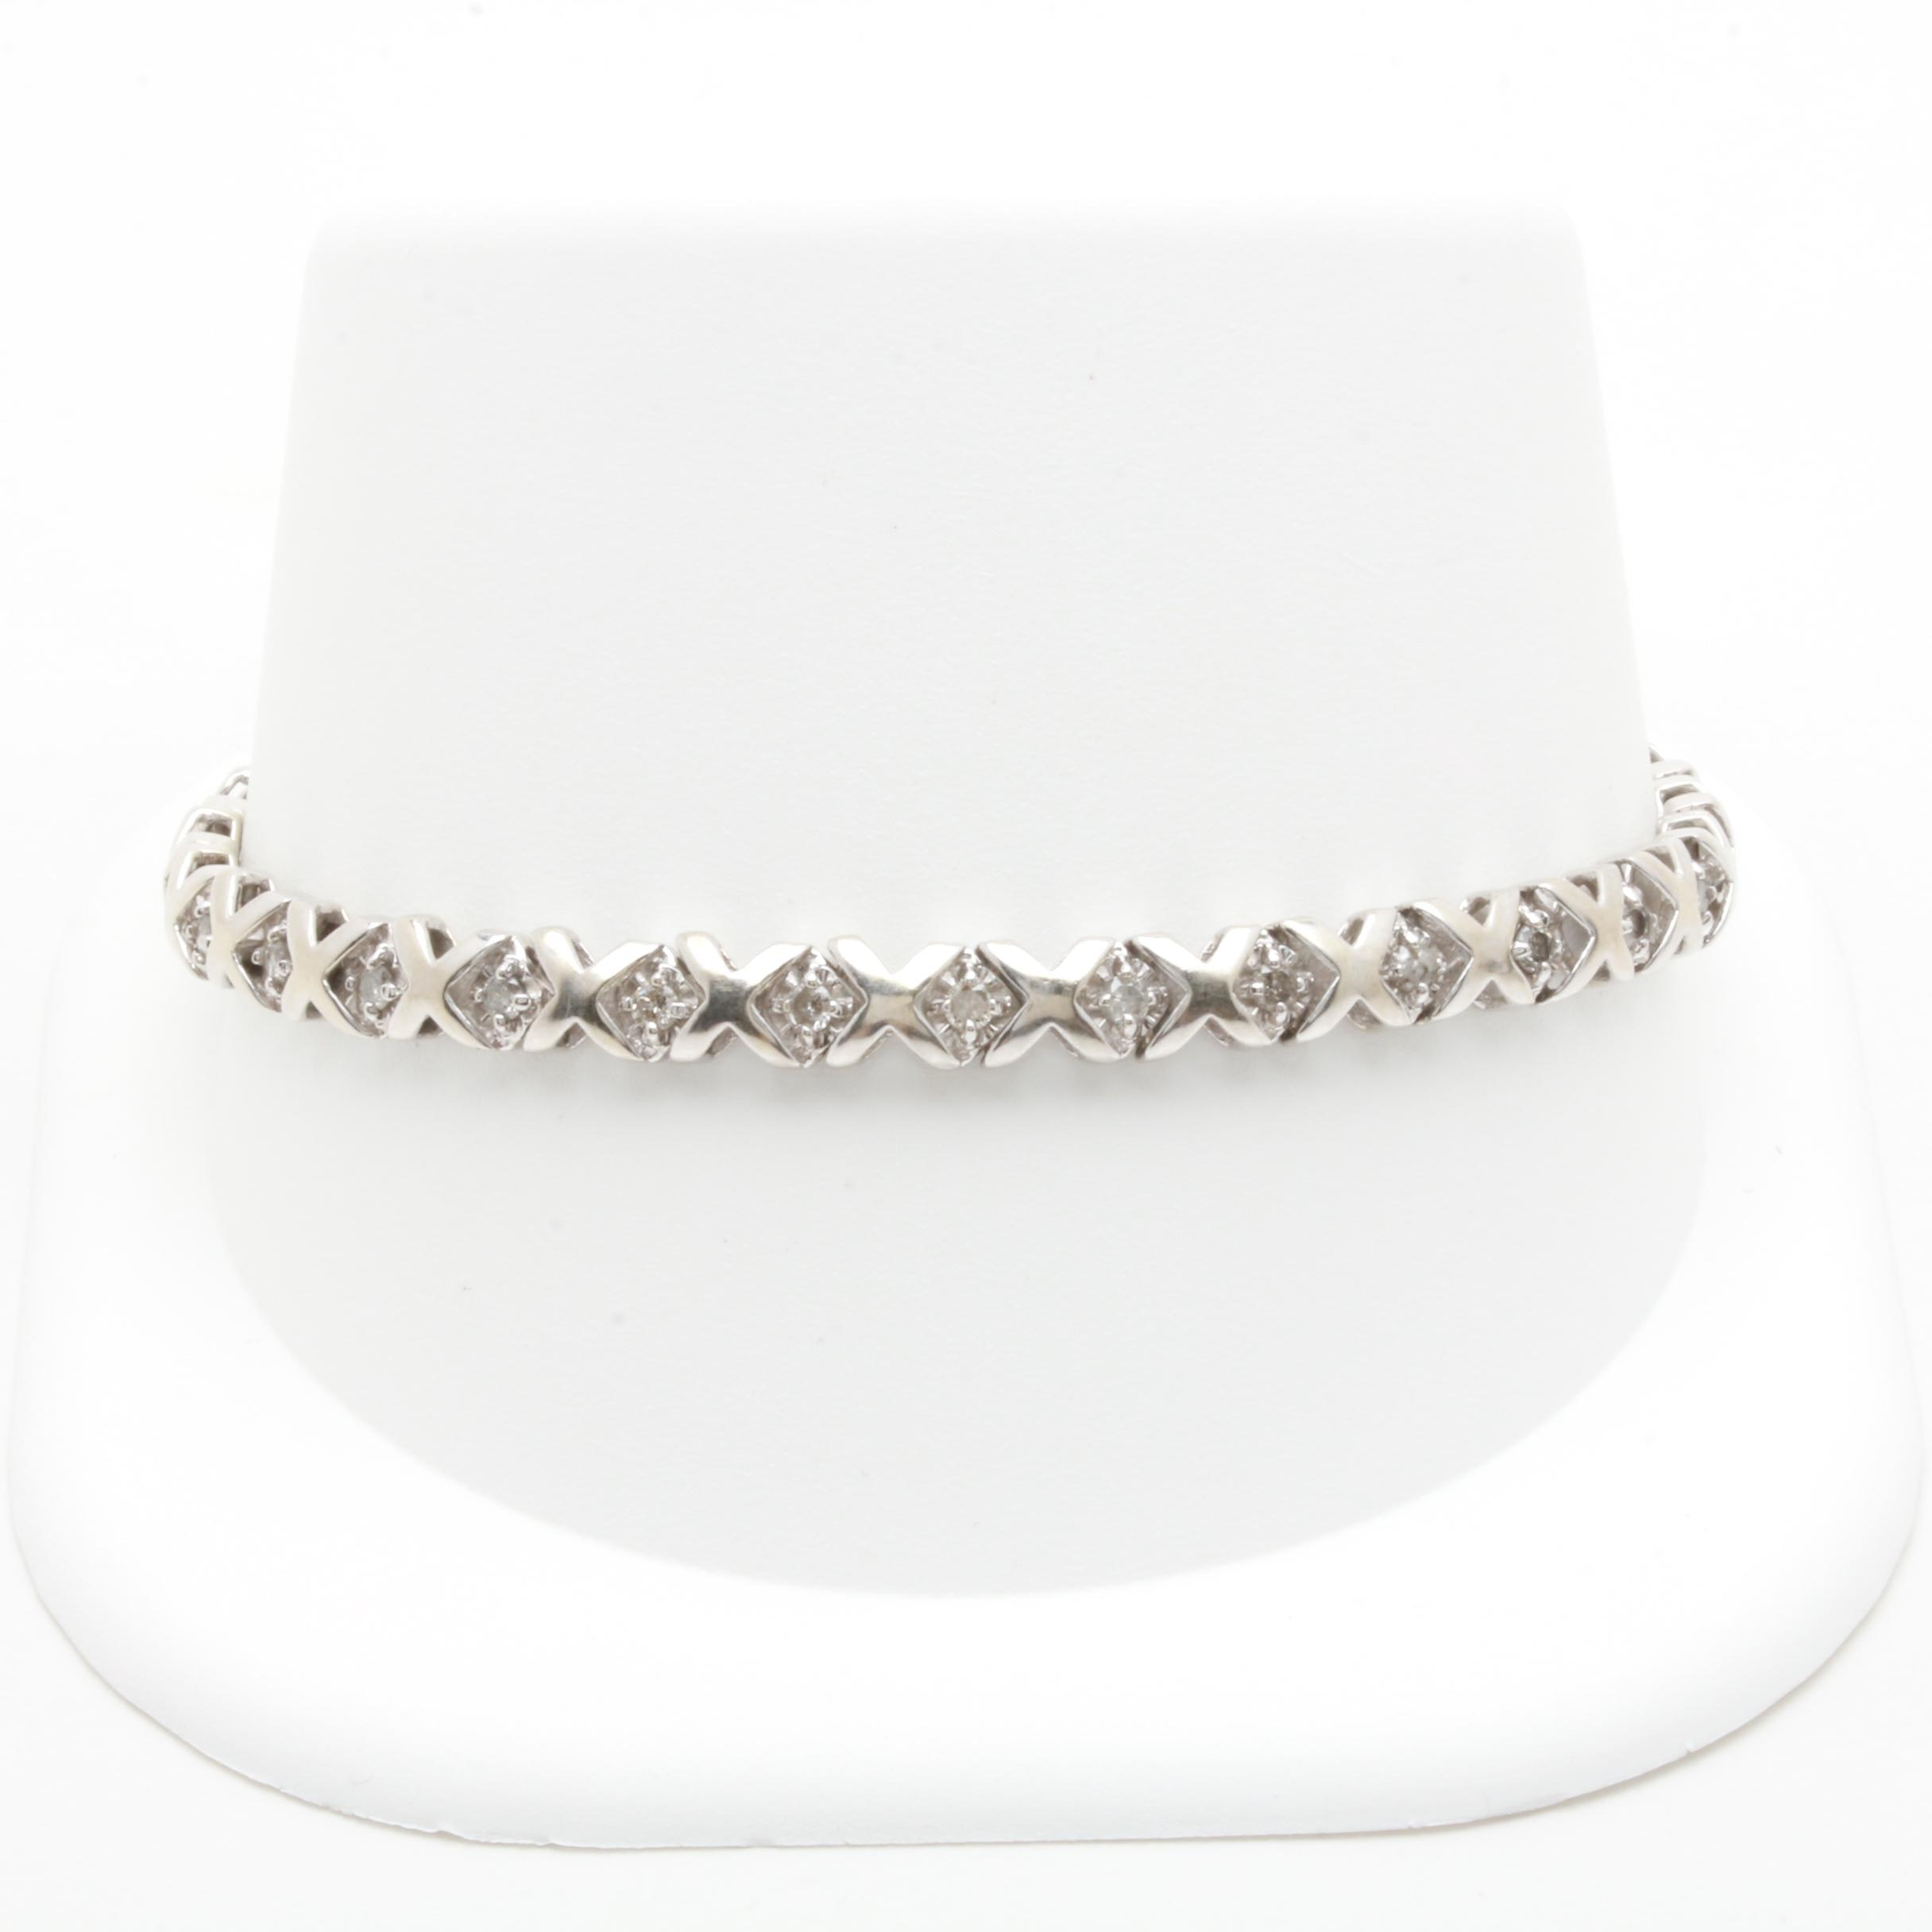 10K White Gold Diamond Link Bracelet